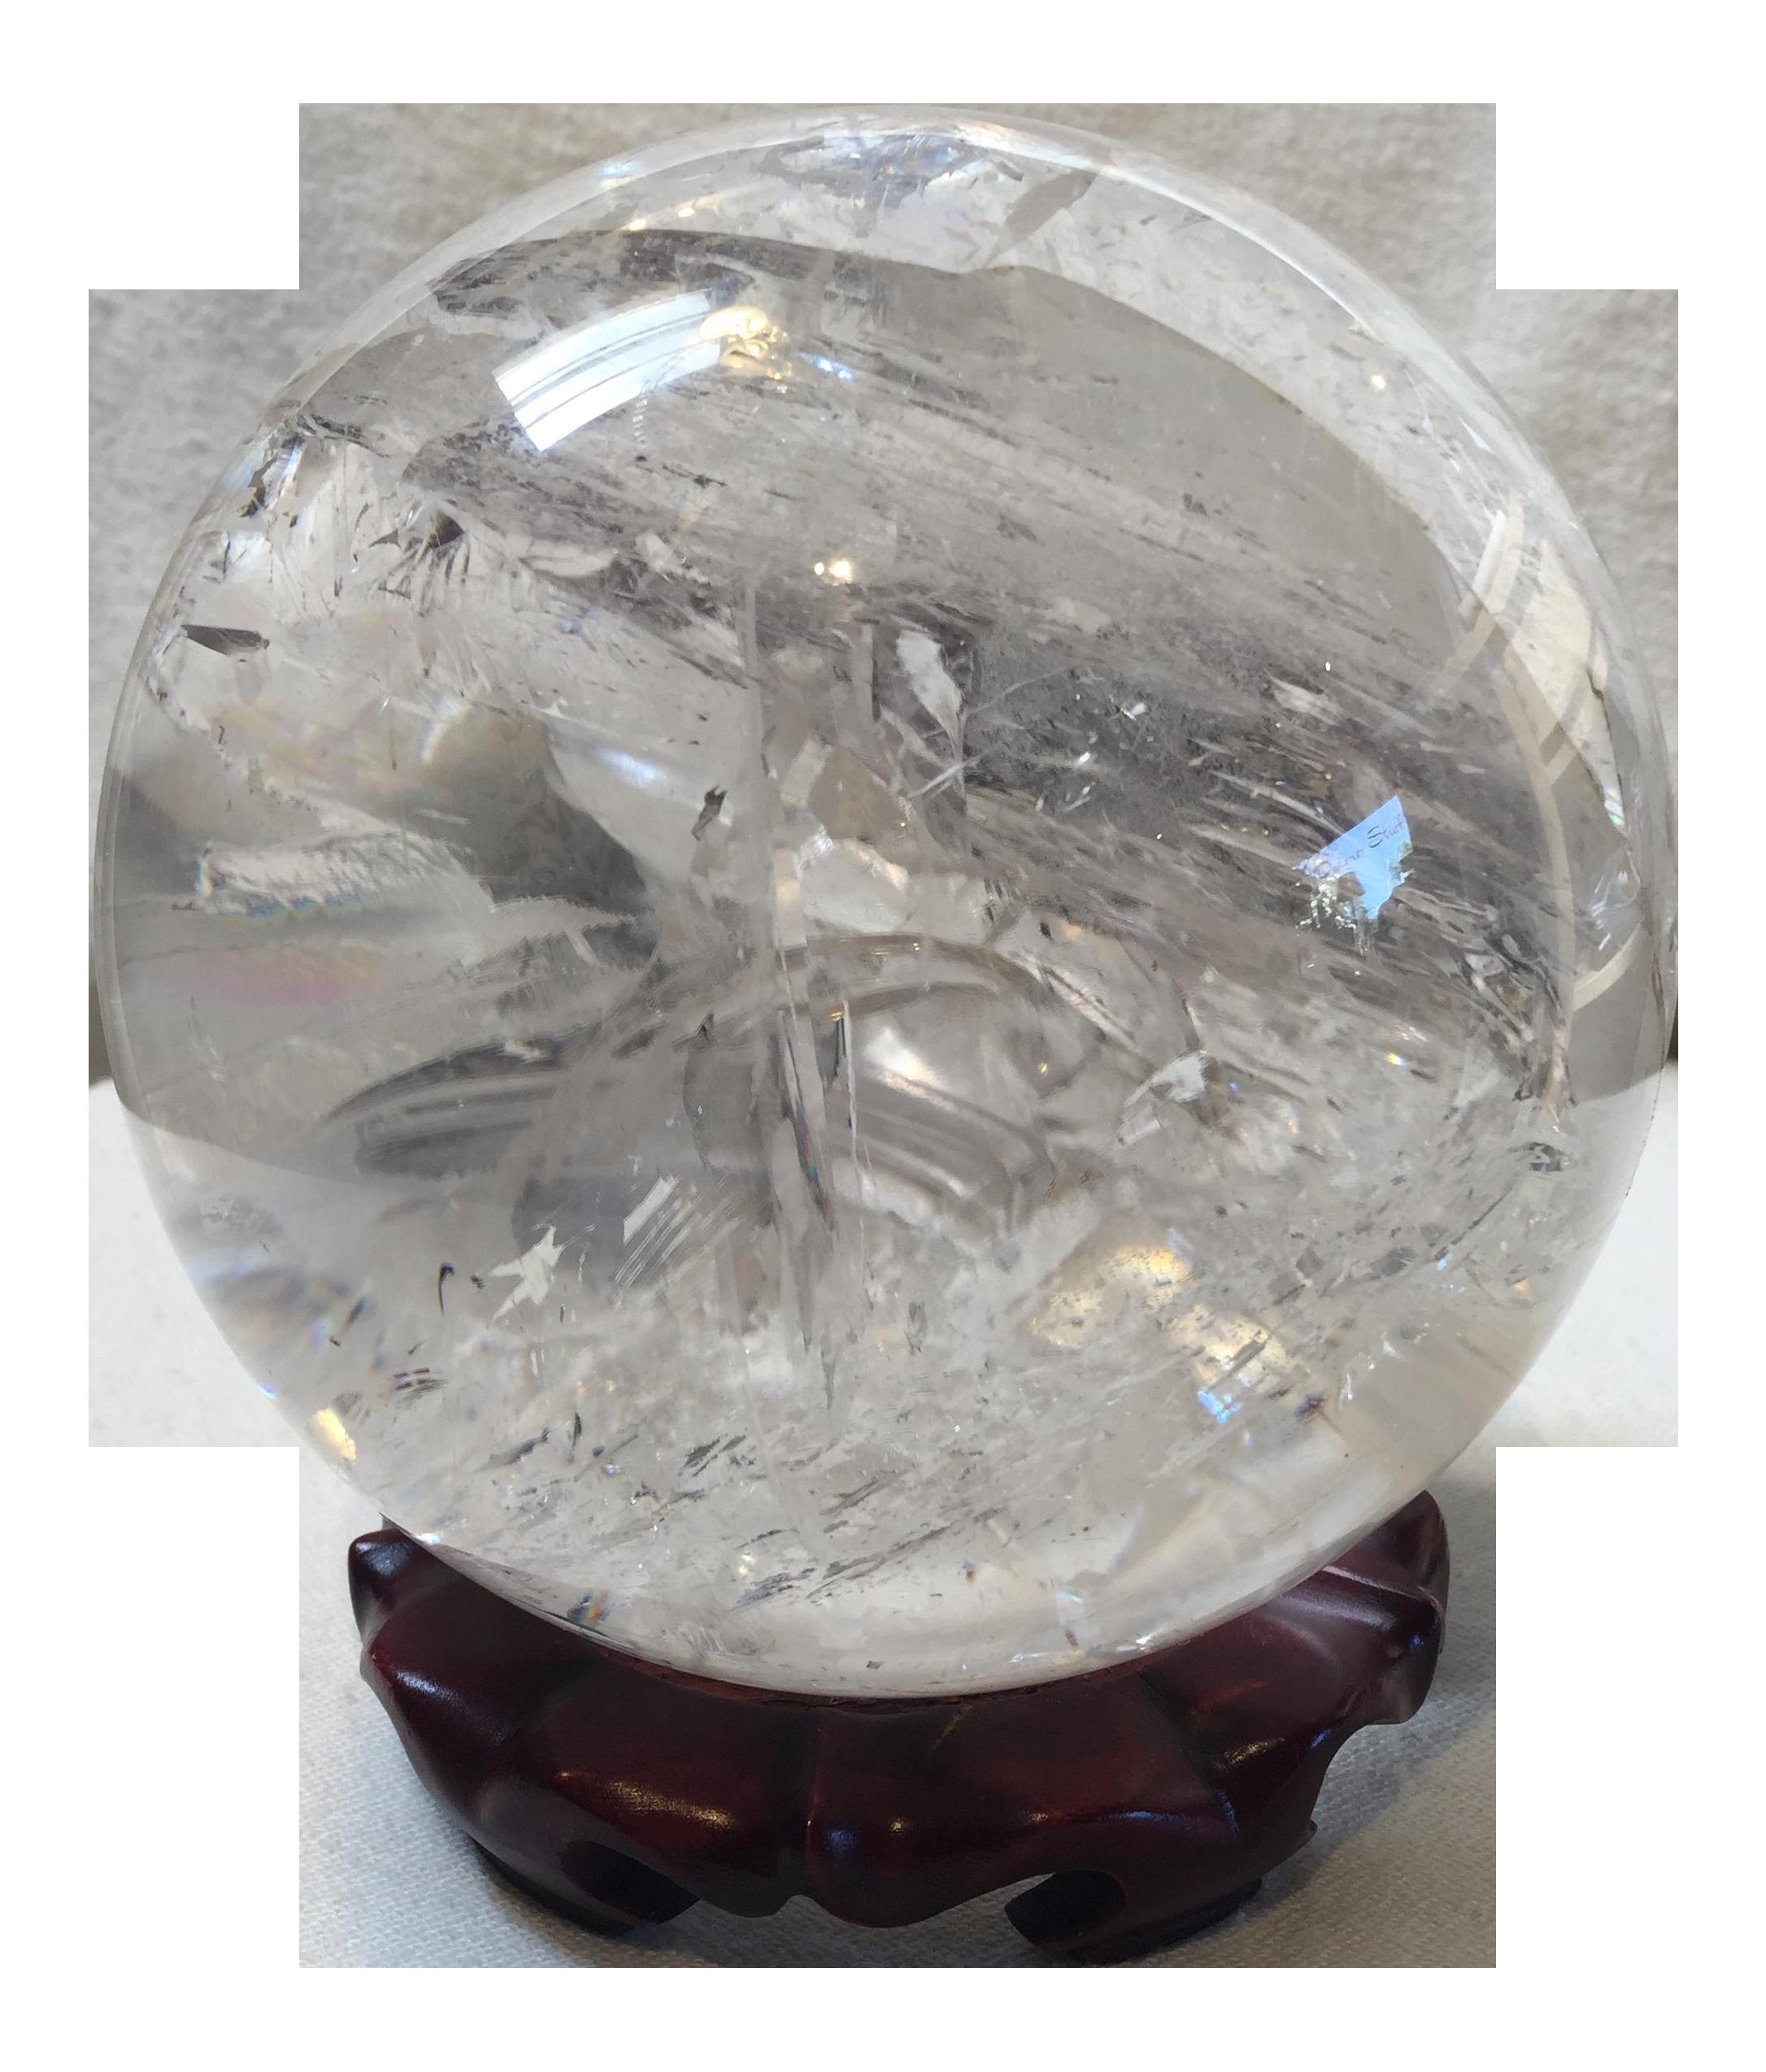 1200 Extra Large Quartz Crystal Ball On Chairish Com Models And Figurines Crystal Ball Crystal Figurines